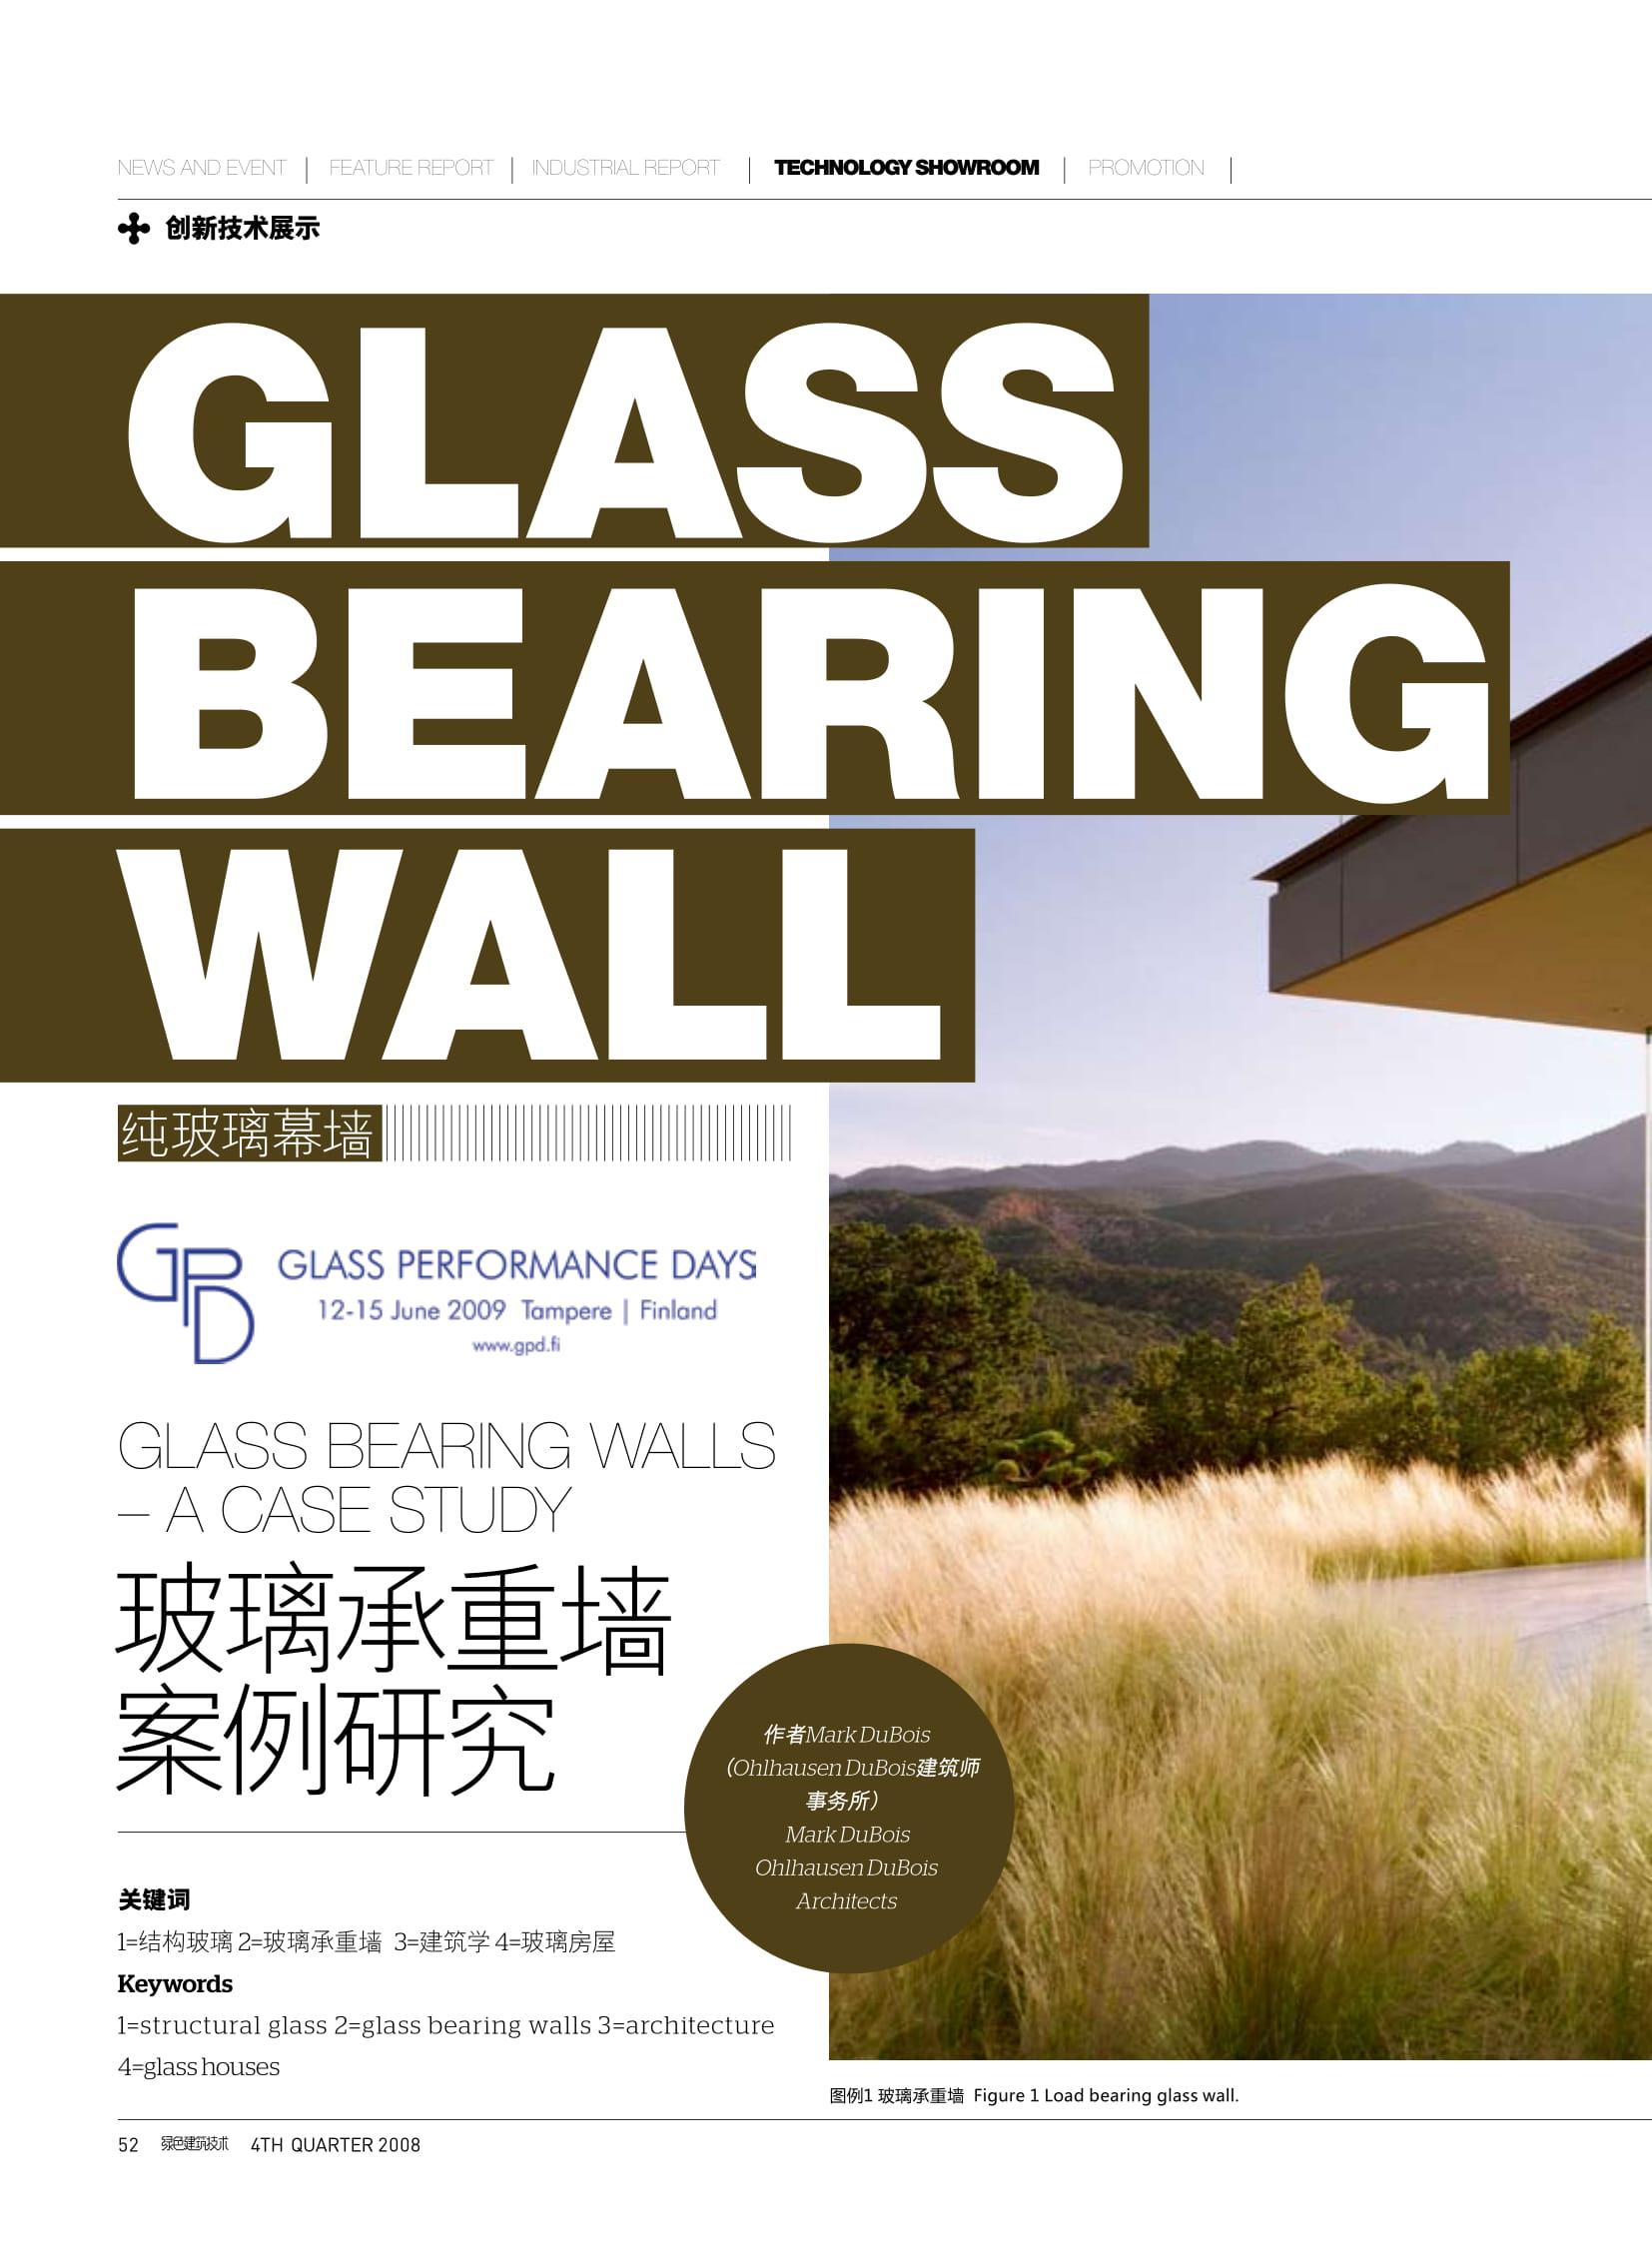 DuBois+Santa+Fe+IGA+Glass+Bearing+Wall-01.jpg